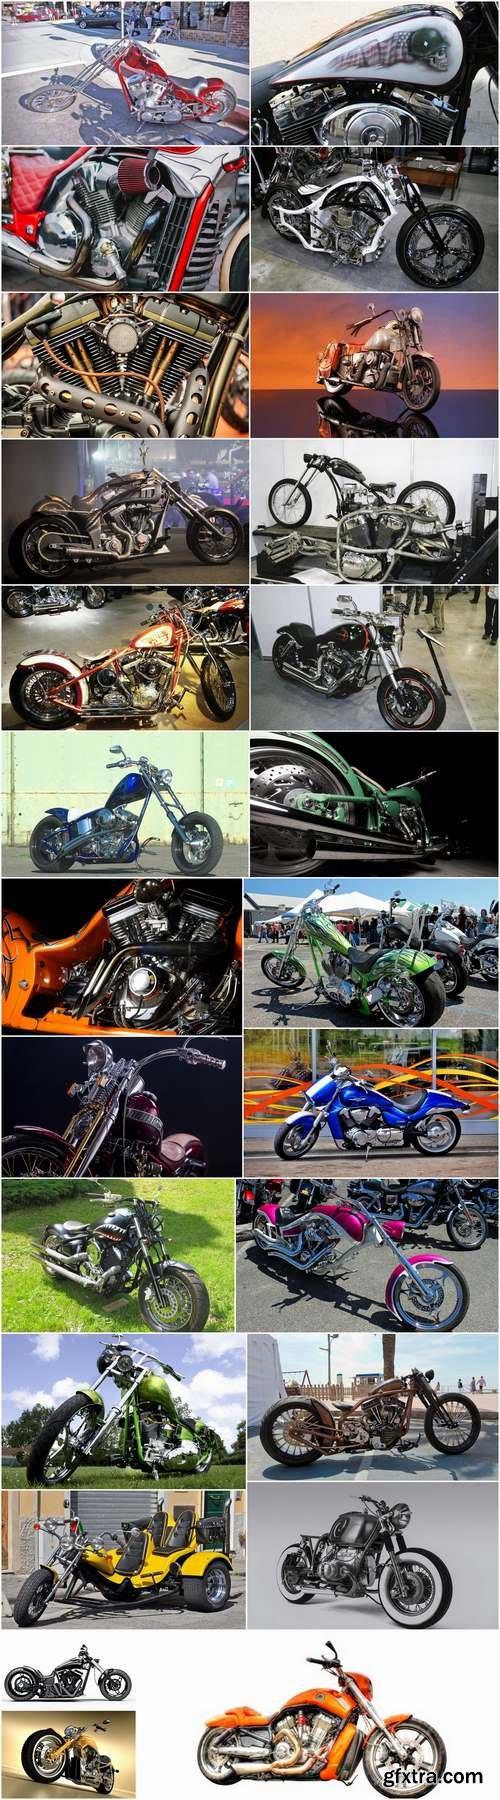 Motorcycle Chopper custom bike building 25 HQ Jpeg